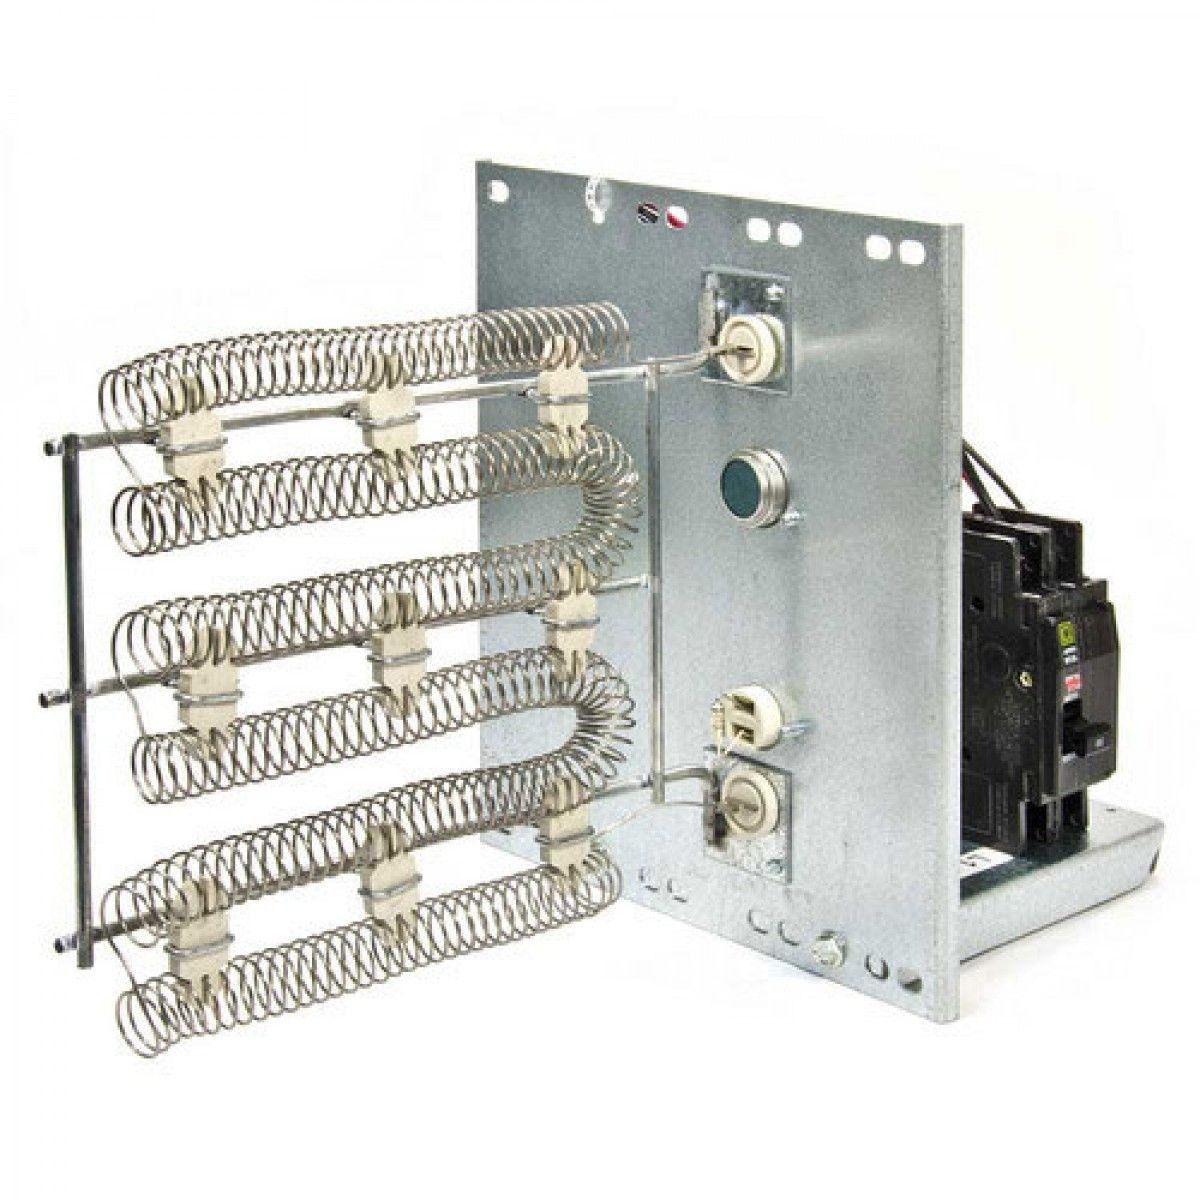 5 Kw Goodman Hkr 05 Electric Heat Kits For Air Handlers